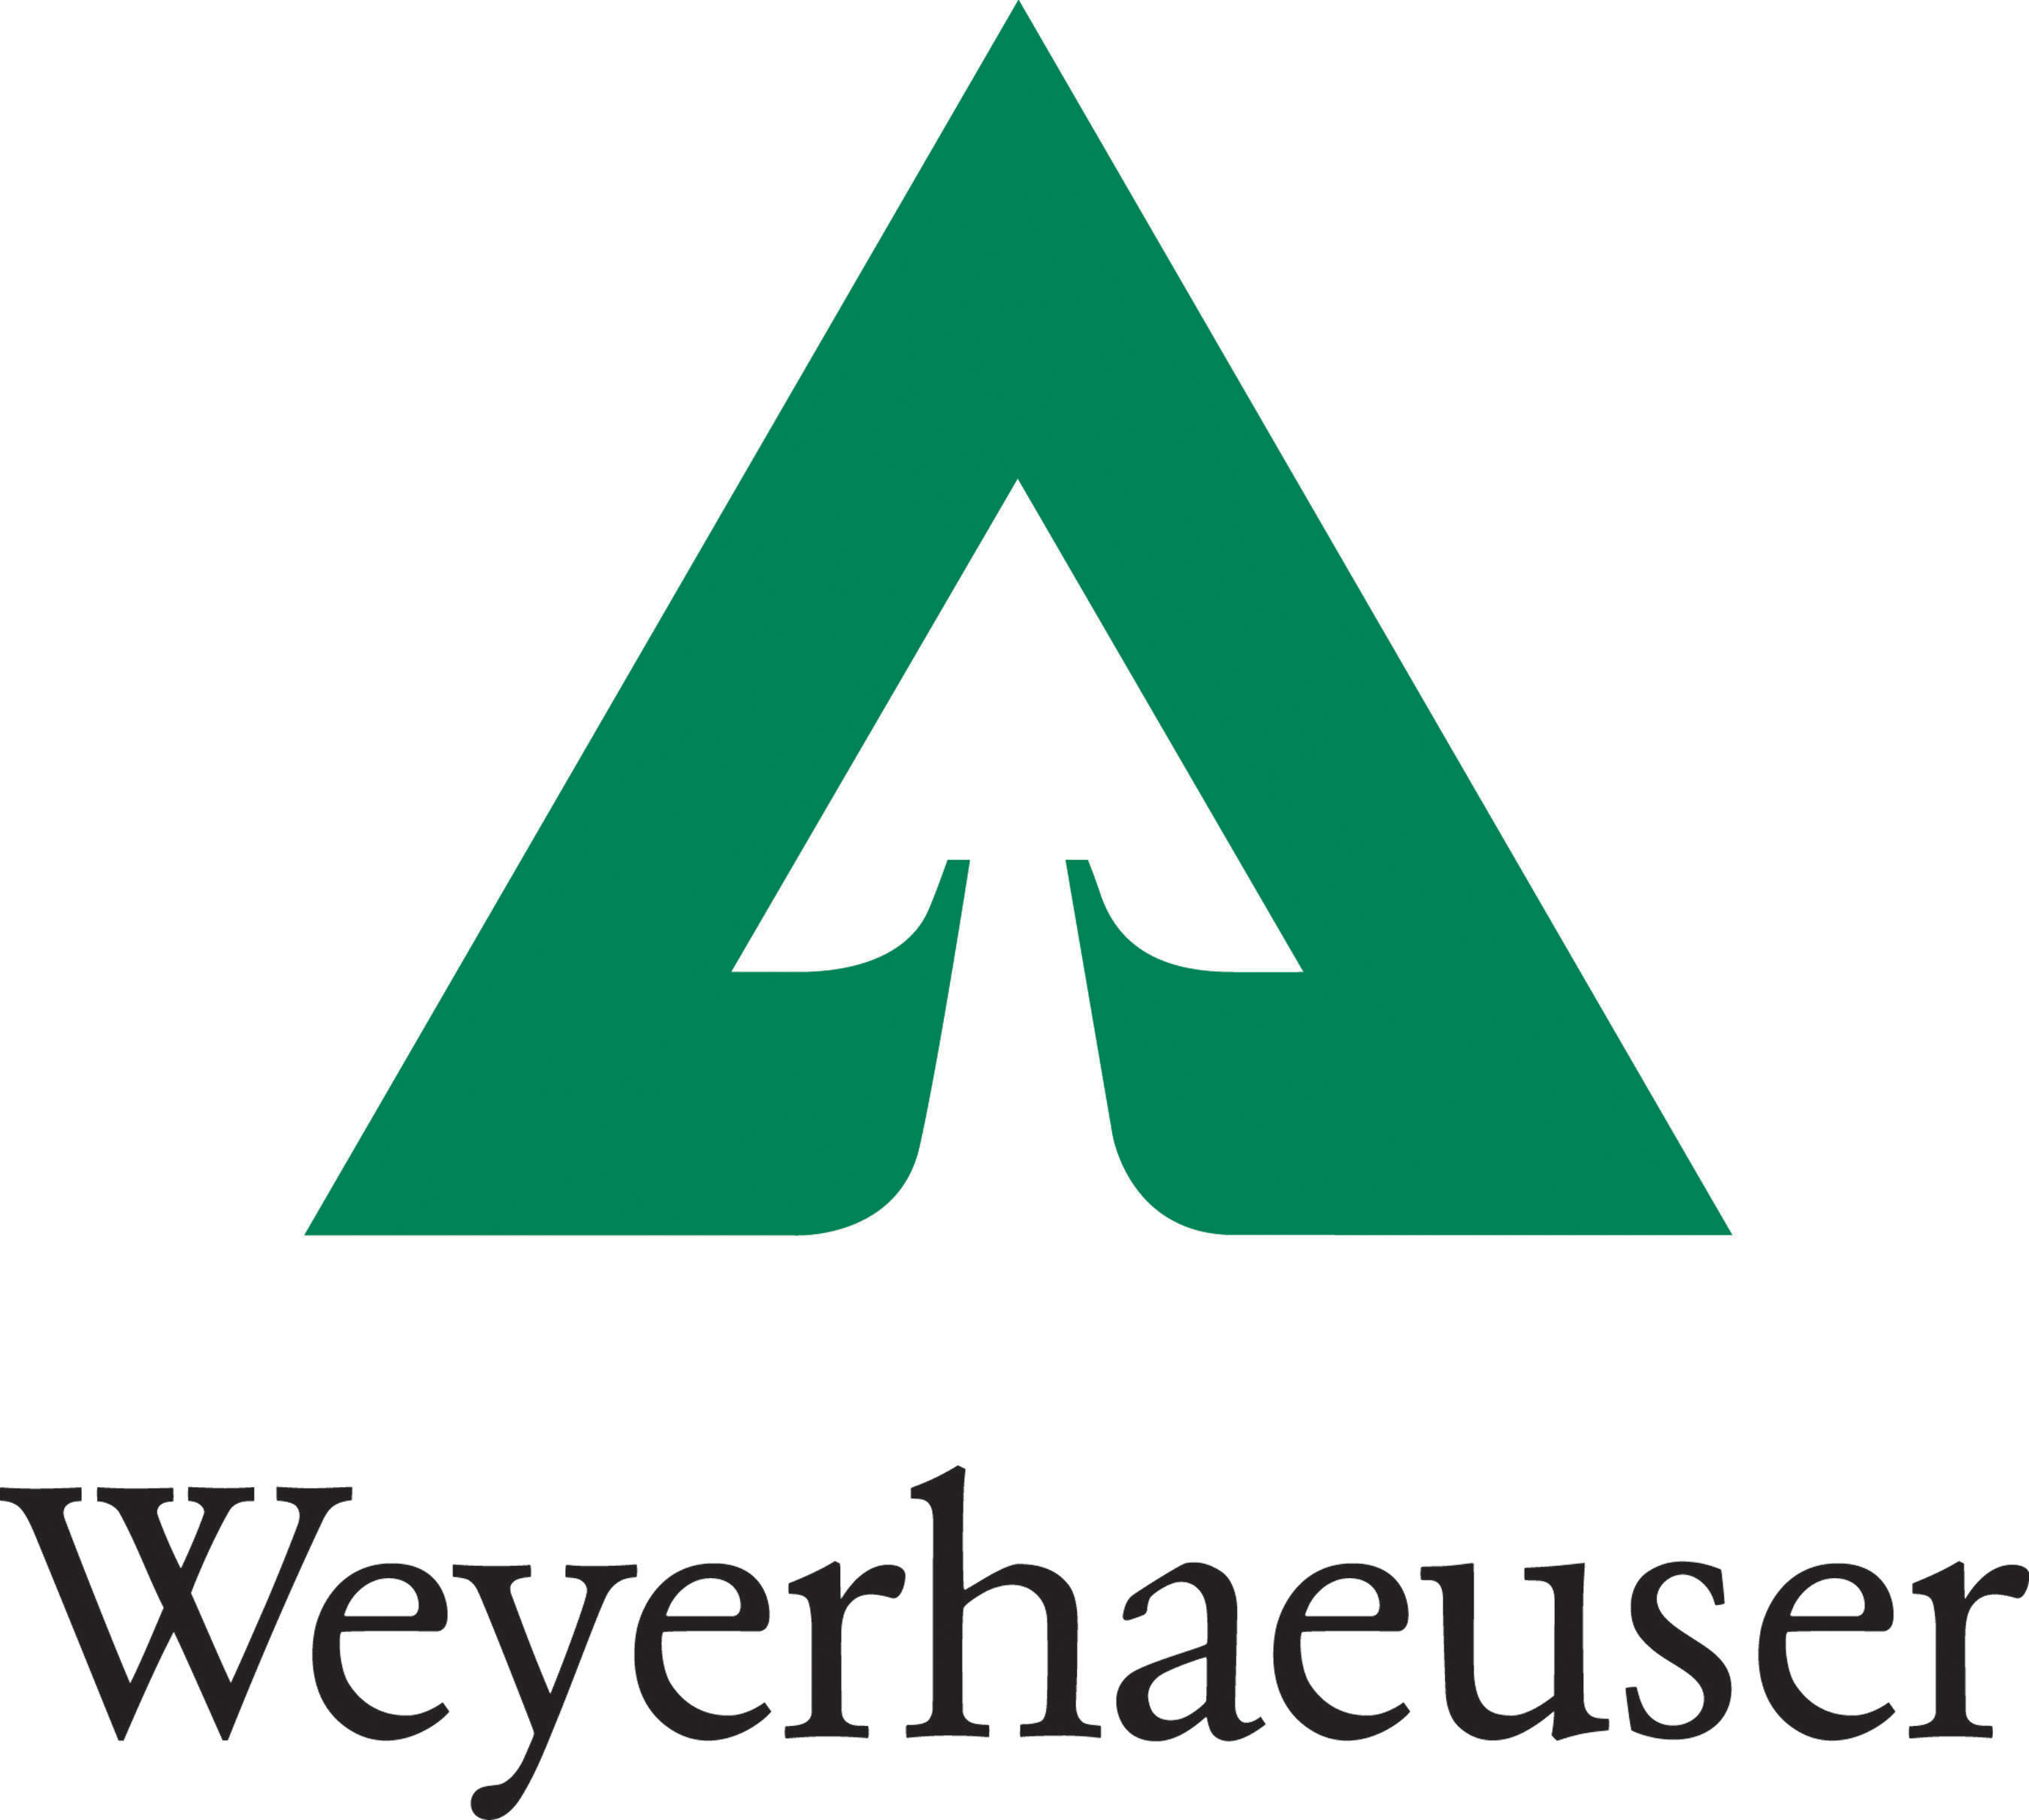 Weyerhaeuser Company logo.